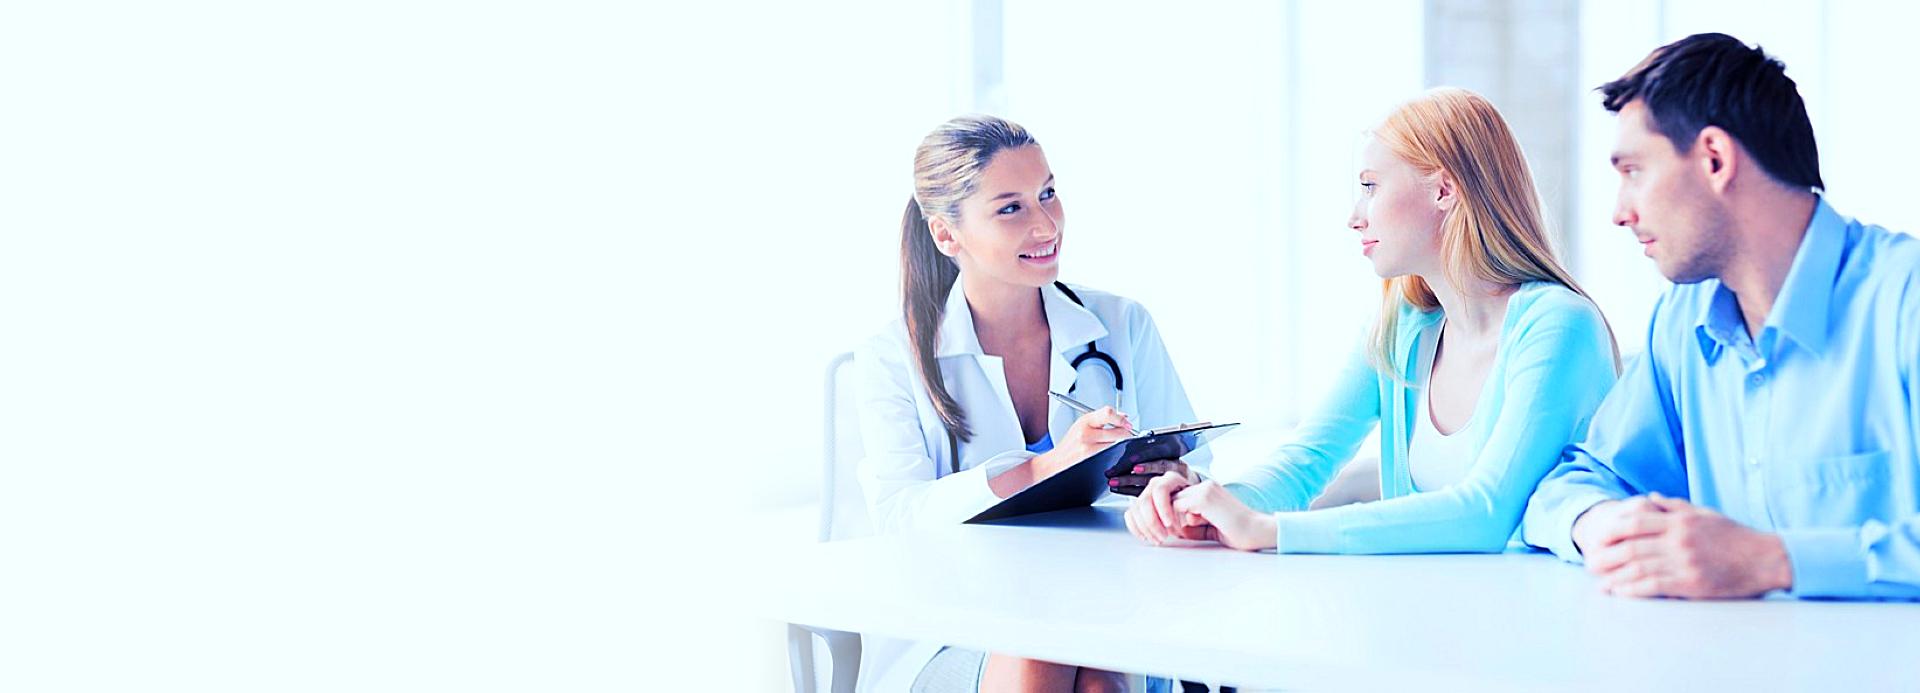 medication planning concept